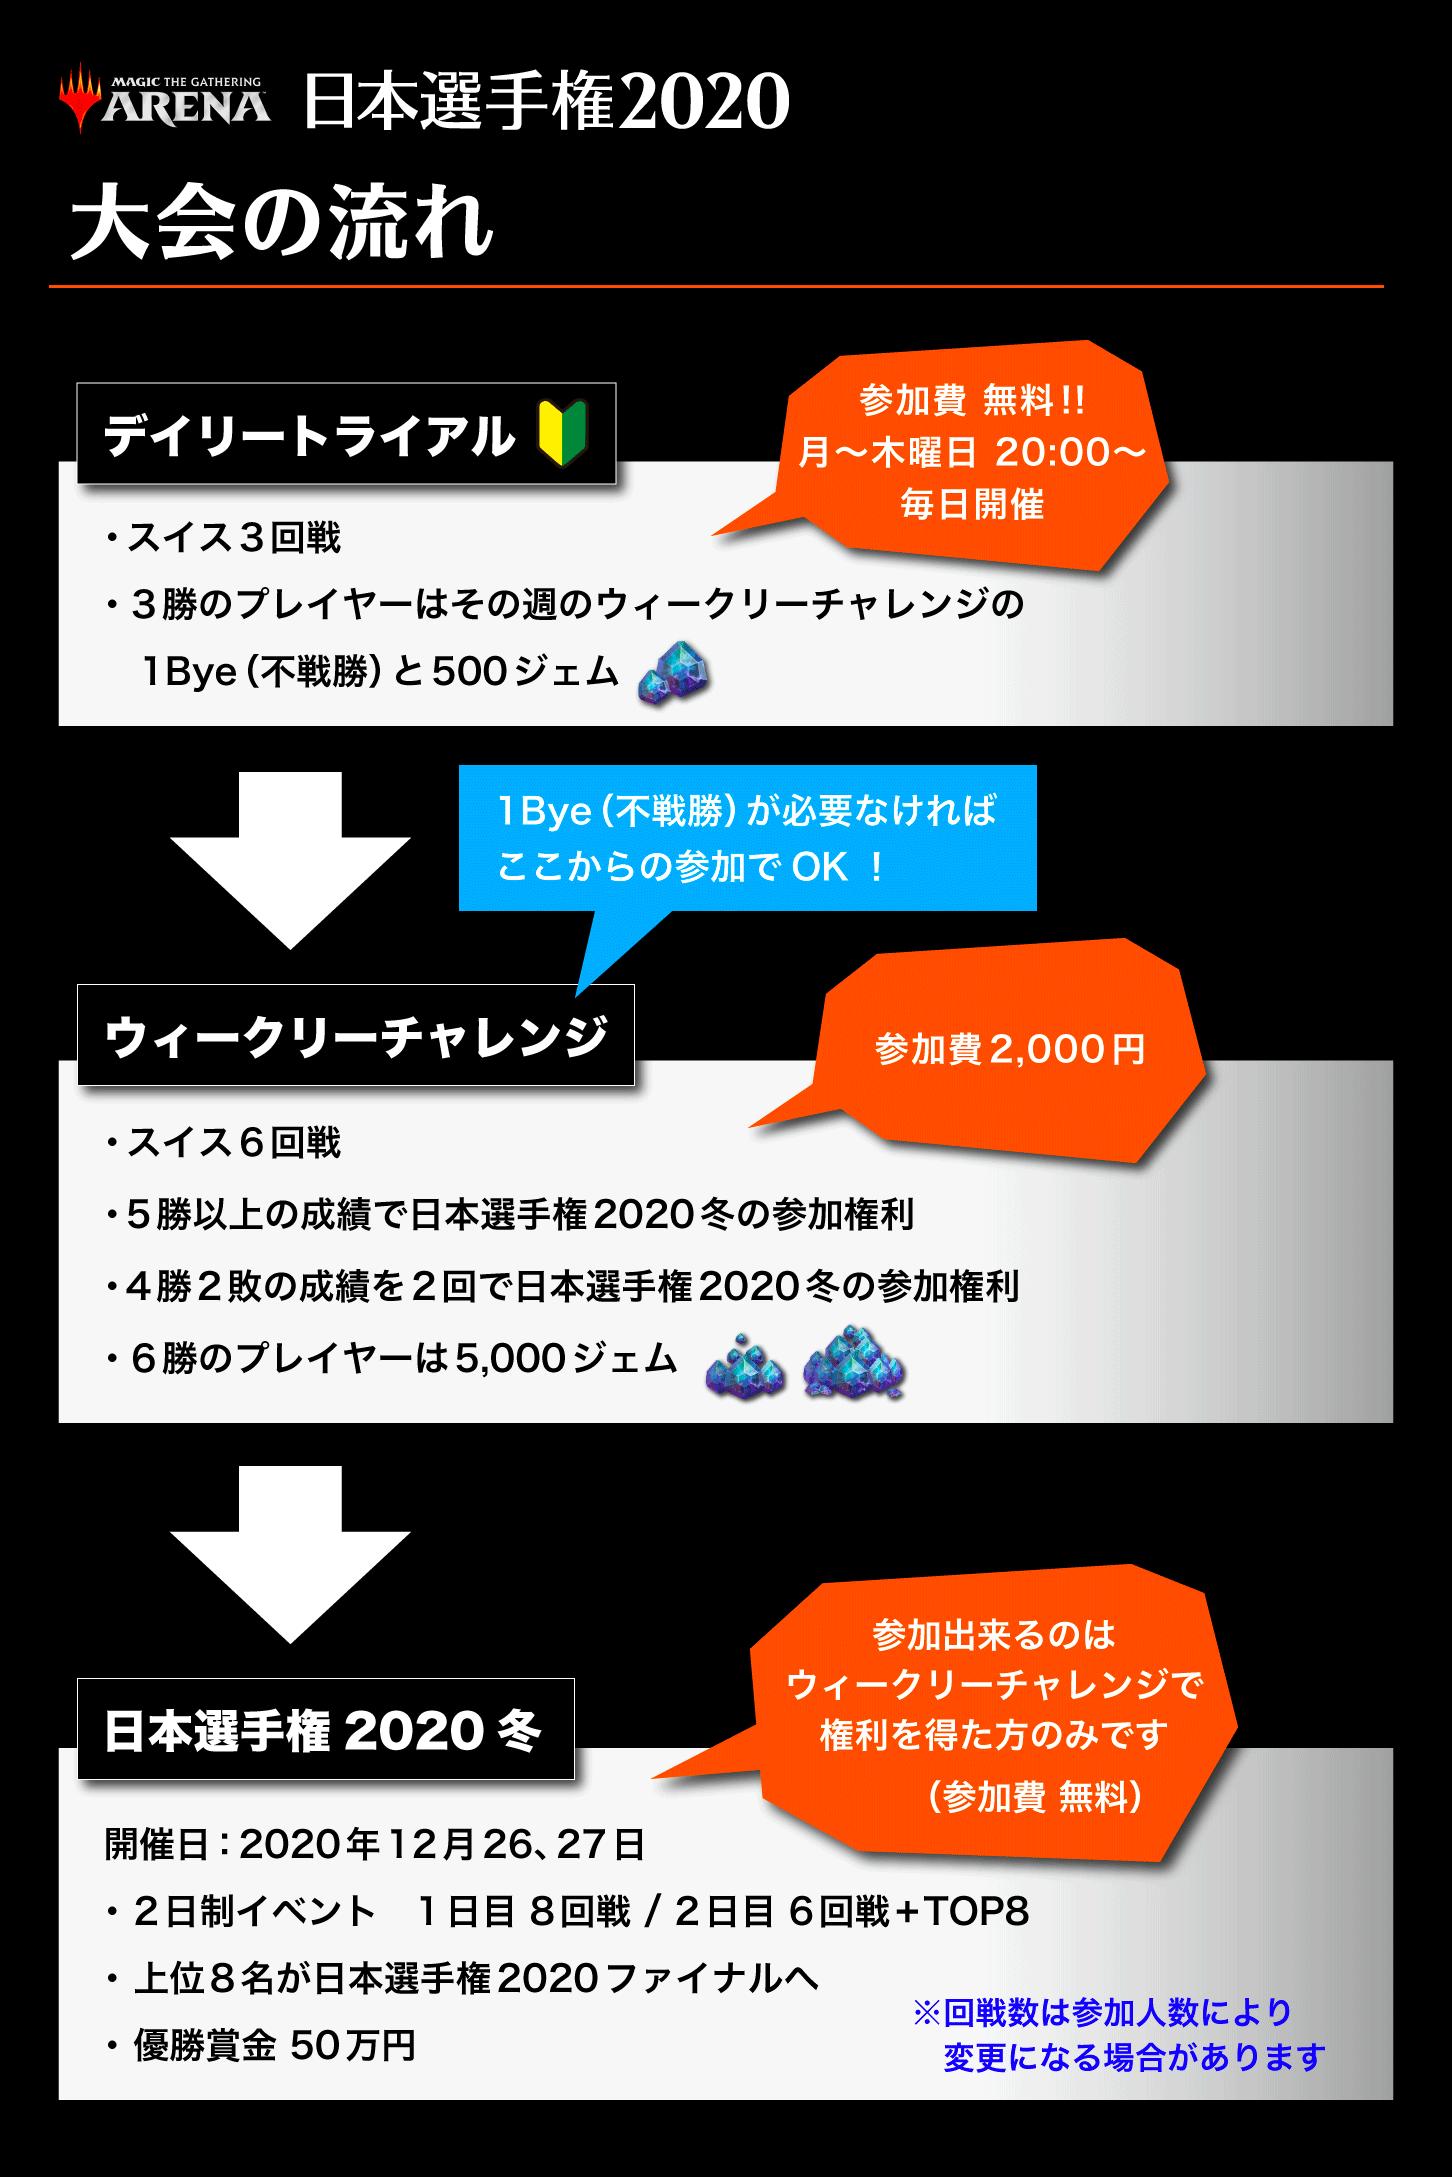 mtgjc2020w_info_flow_4.png